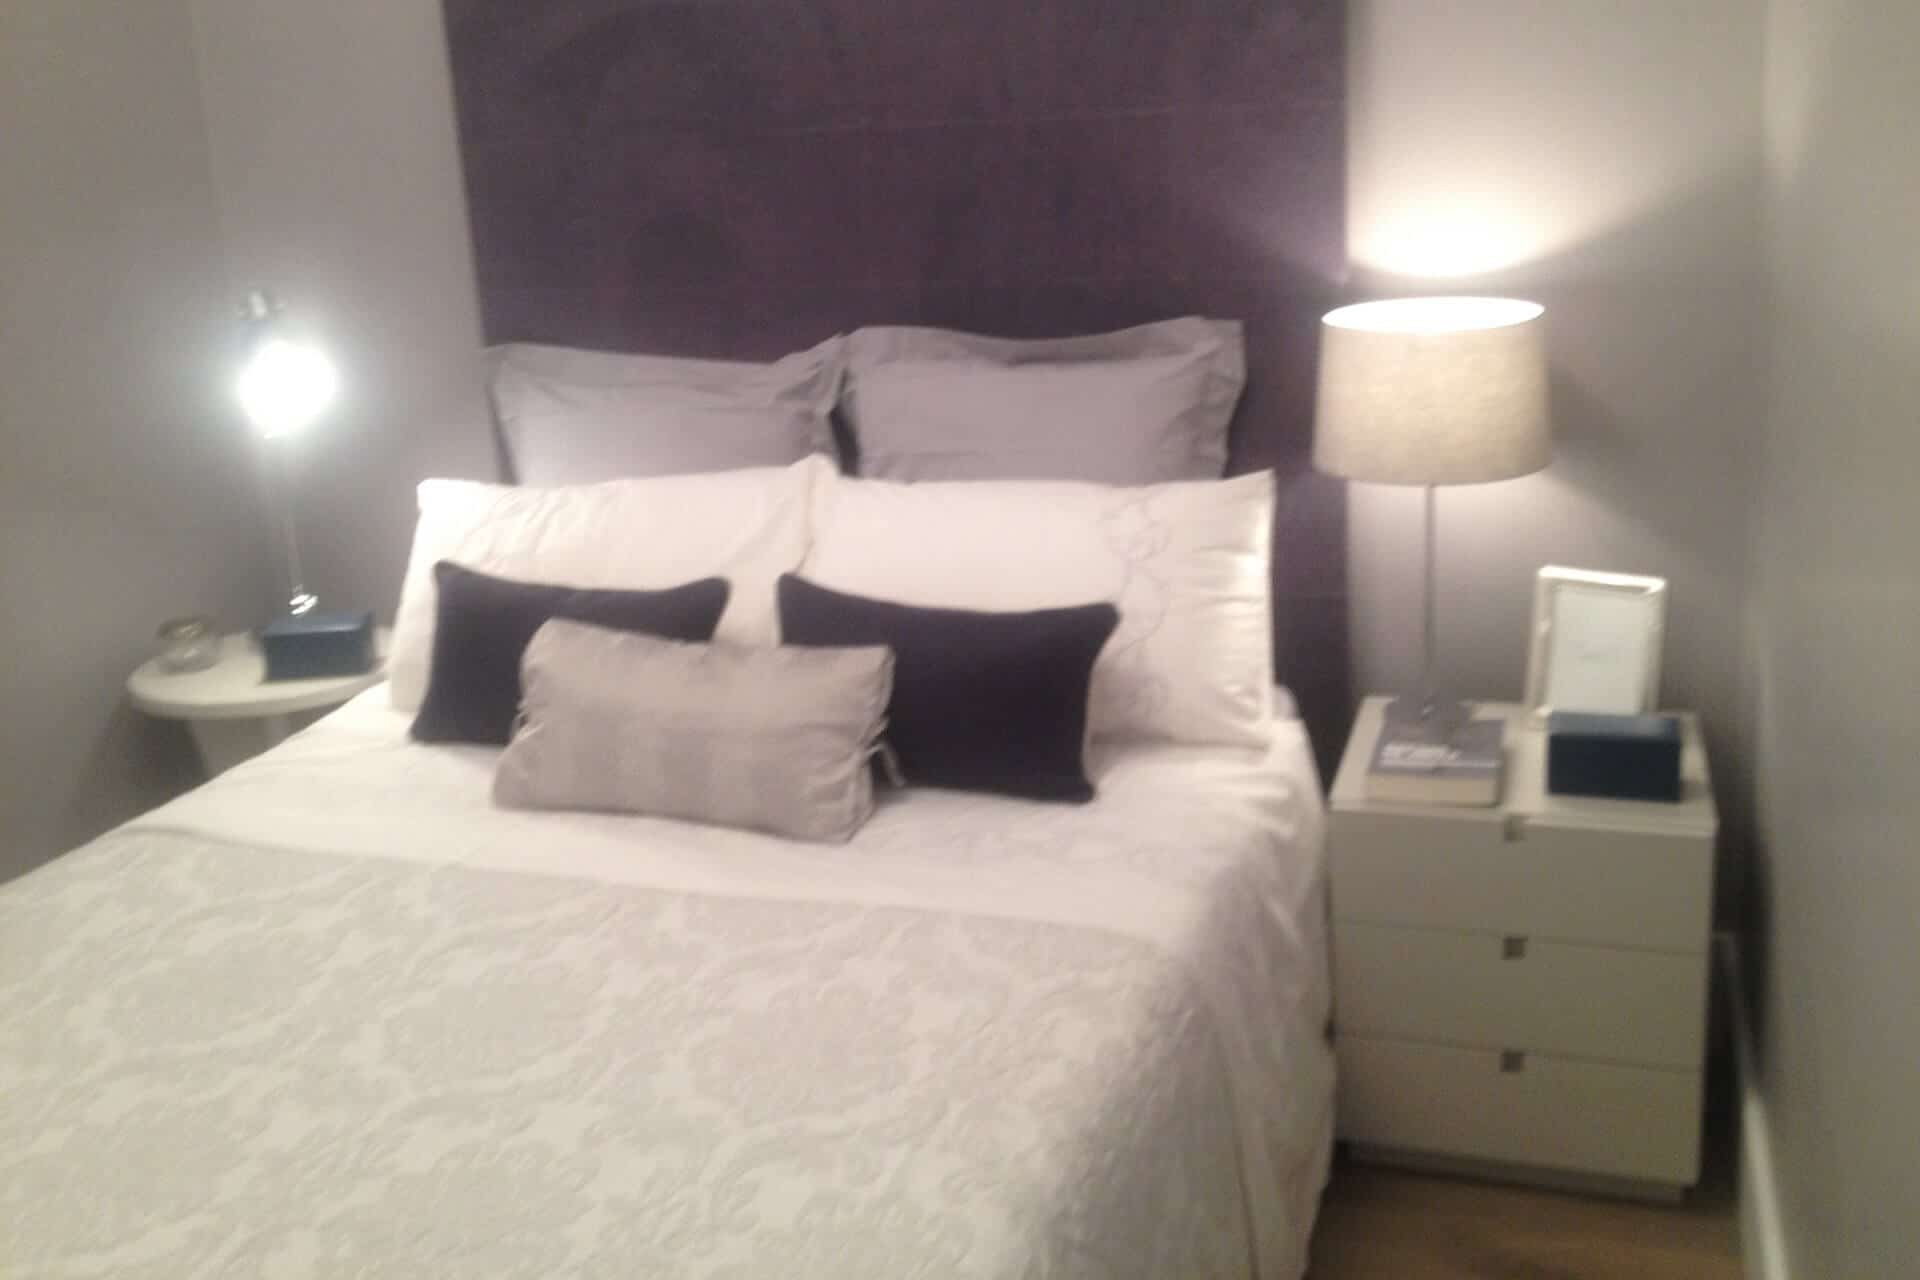 dormitorio-planejado_moveis-sob-medida-galeria-17